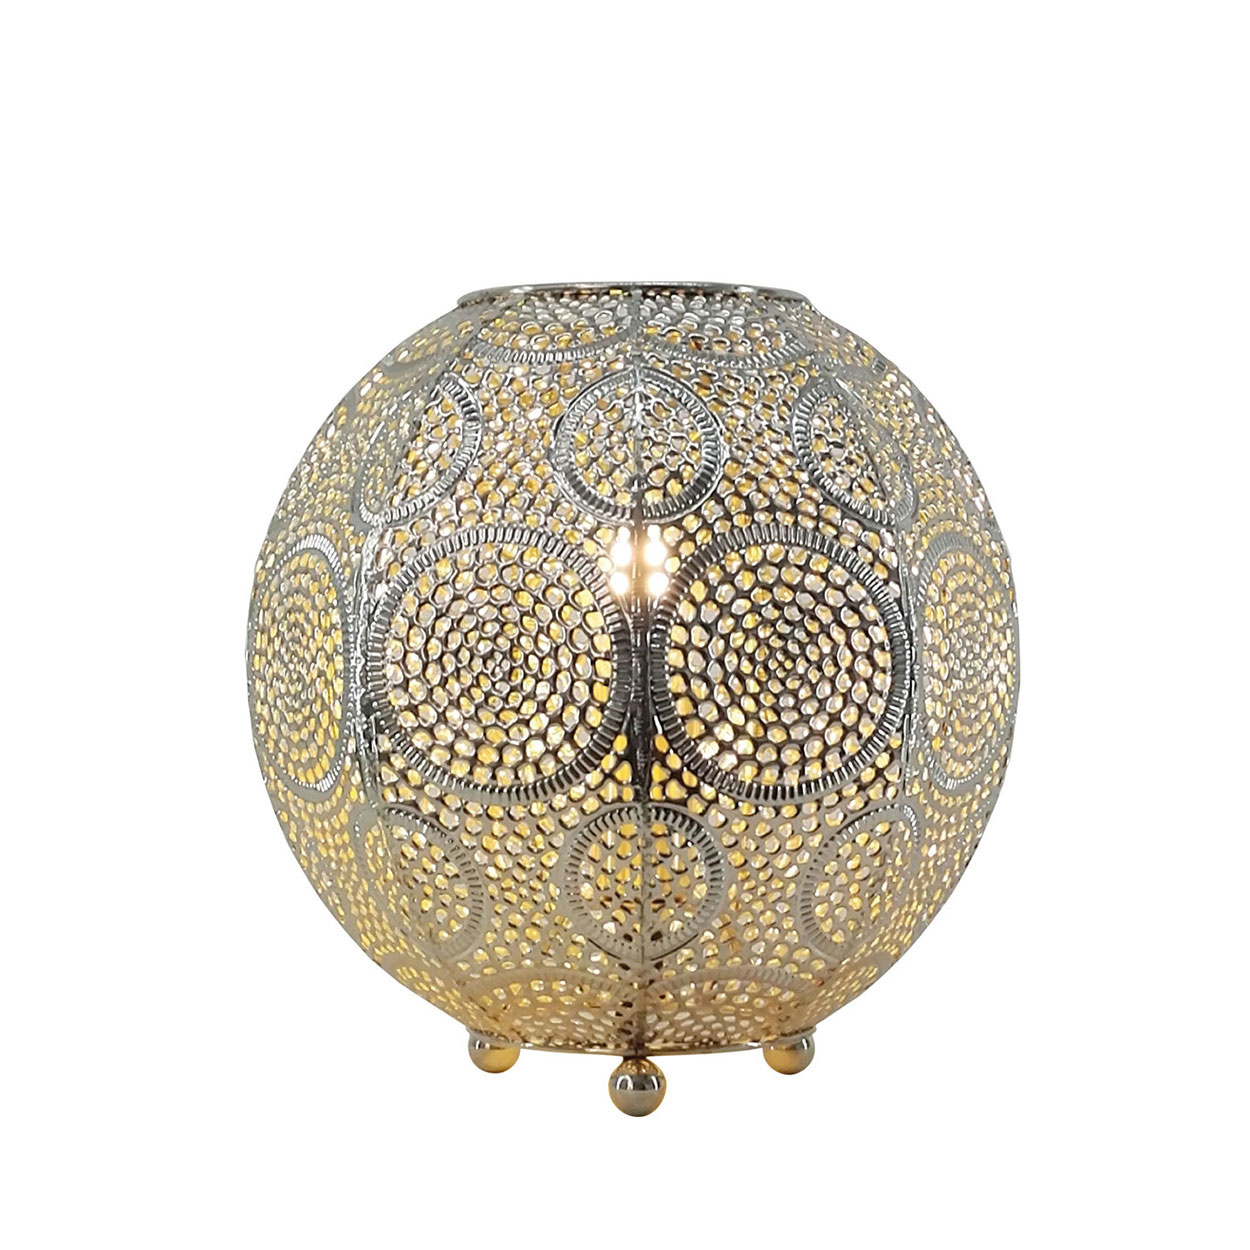 Freelight Tafellamp Stampa 21 cm